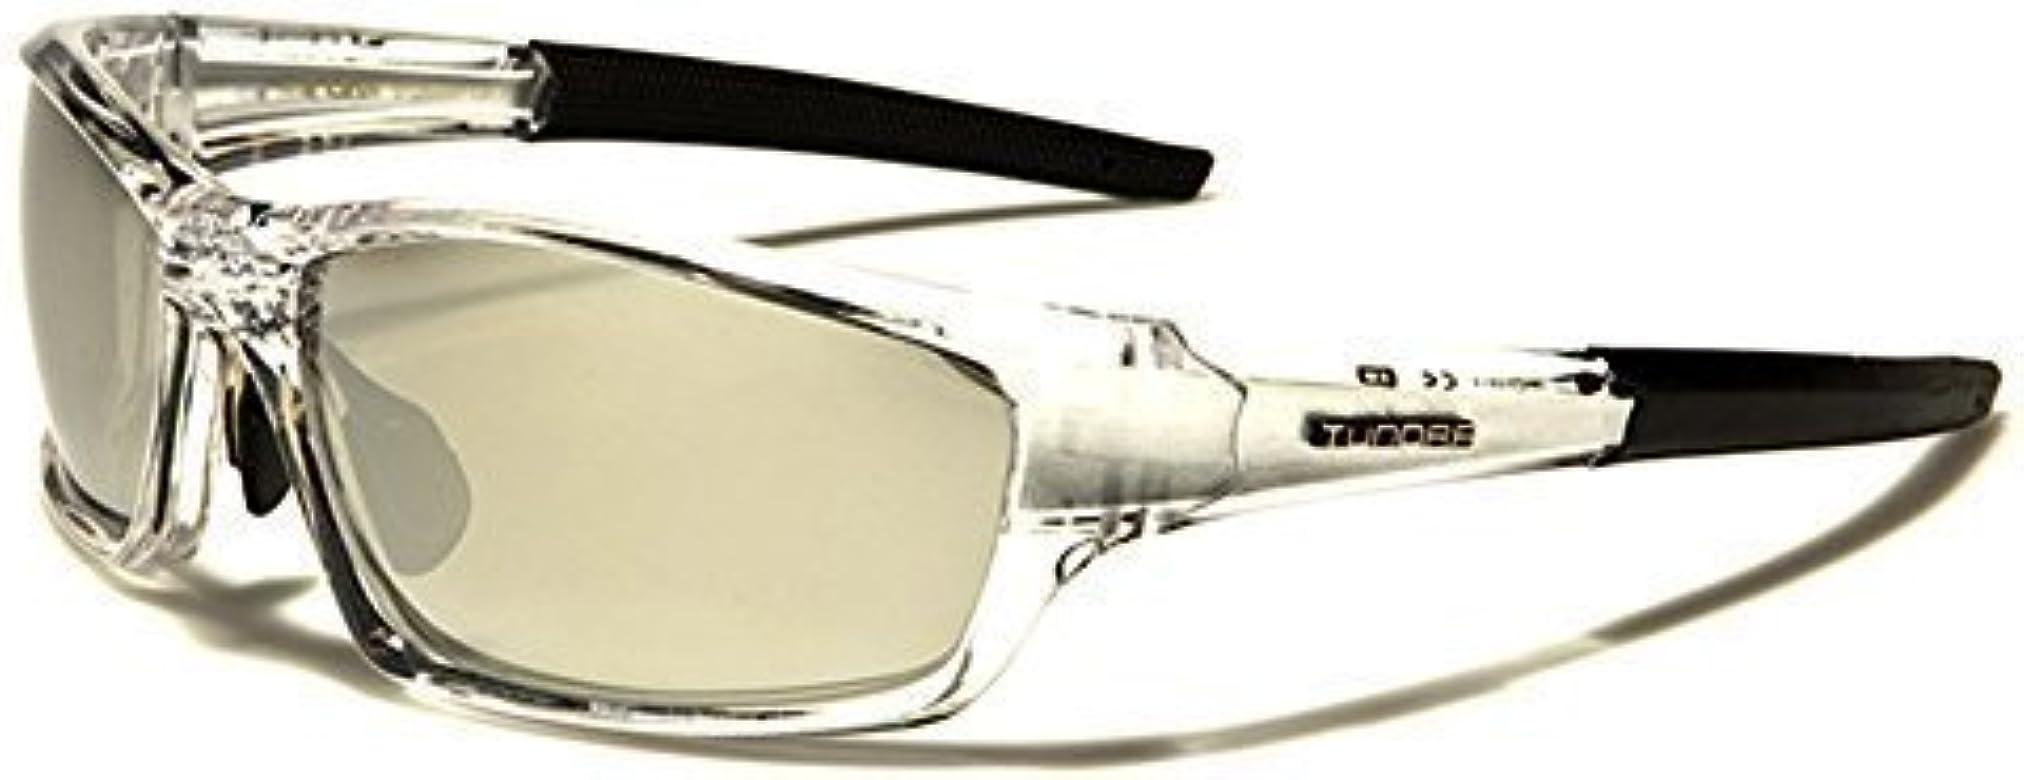 Tundra Hombre Ovalado Gafas Sol Envolventes Anti Brillo ...